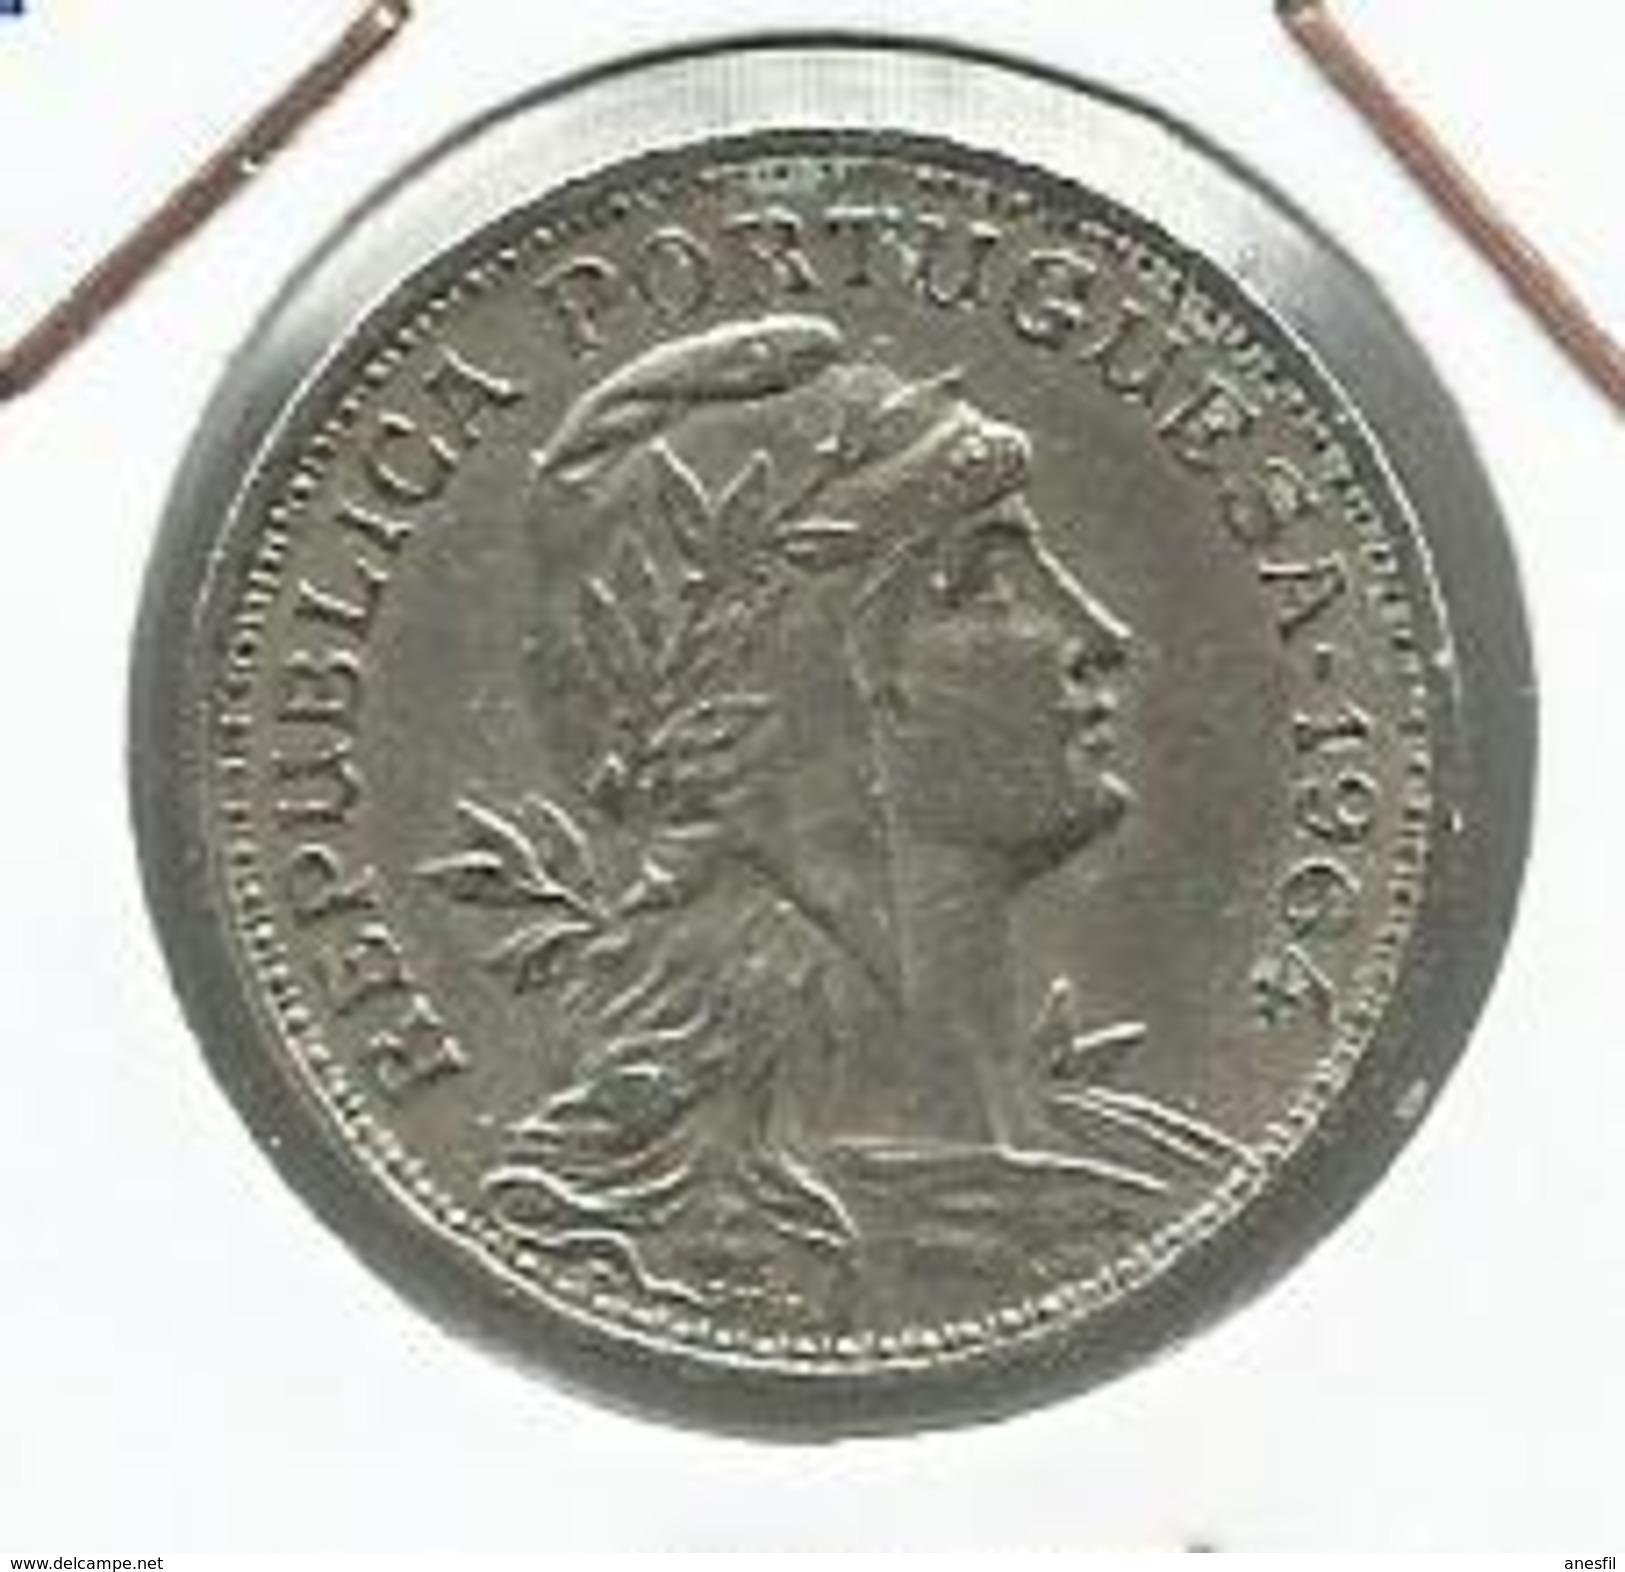 Portugal_1964_50 Centavos. - Portugal